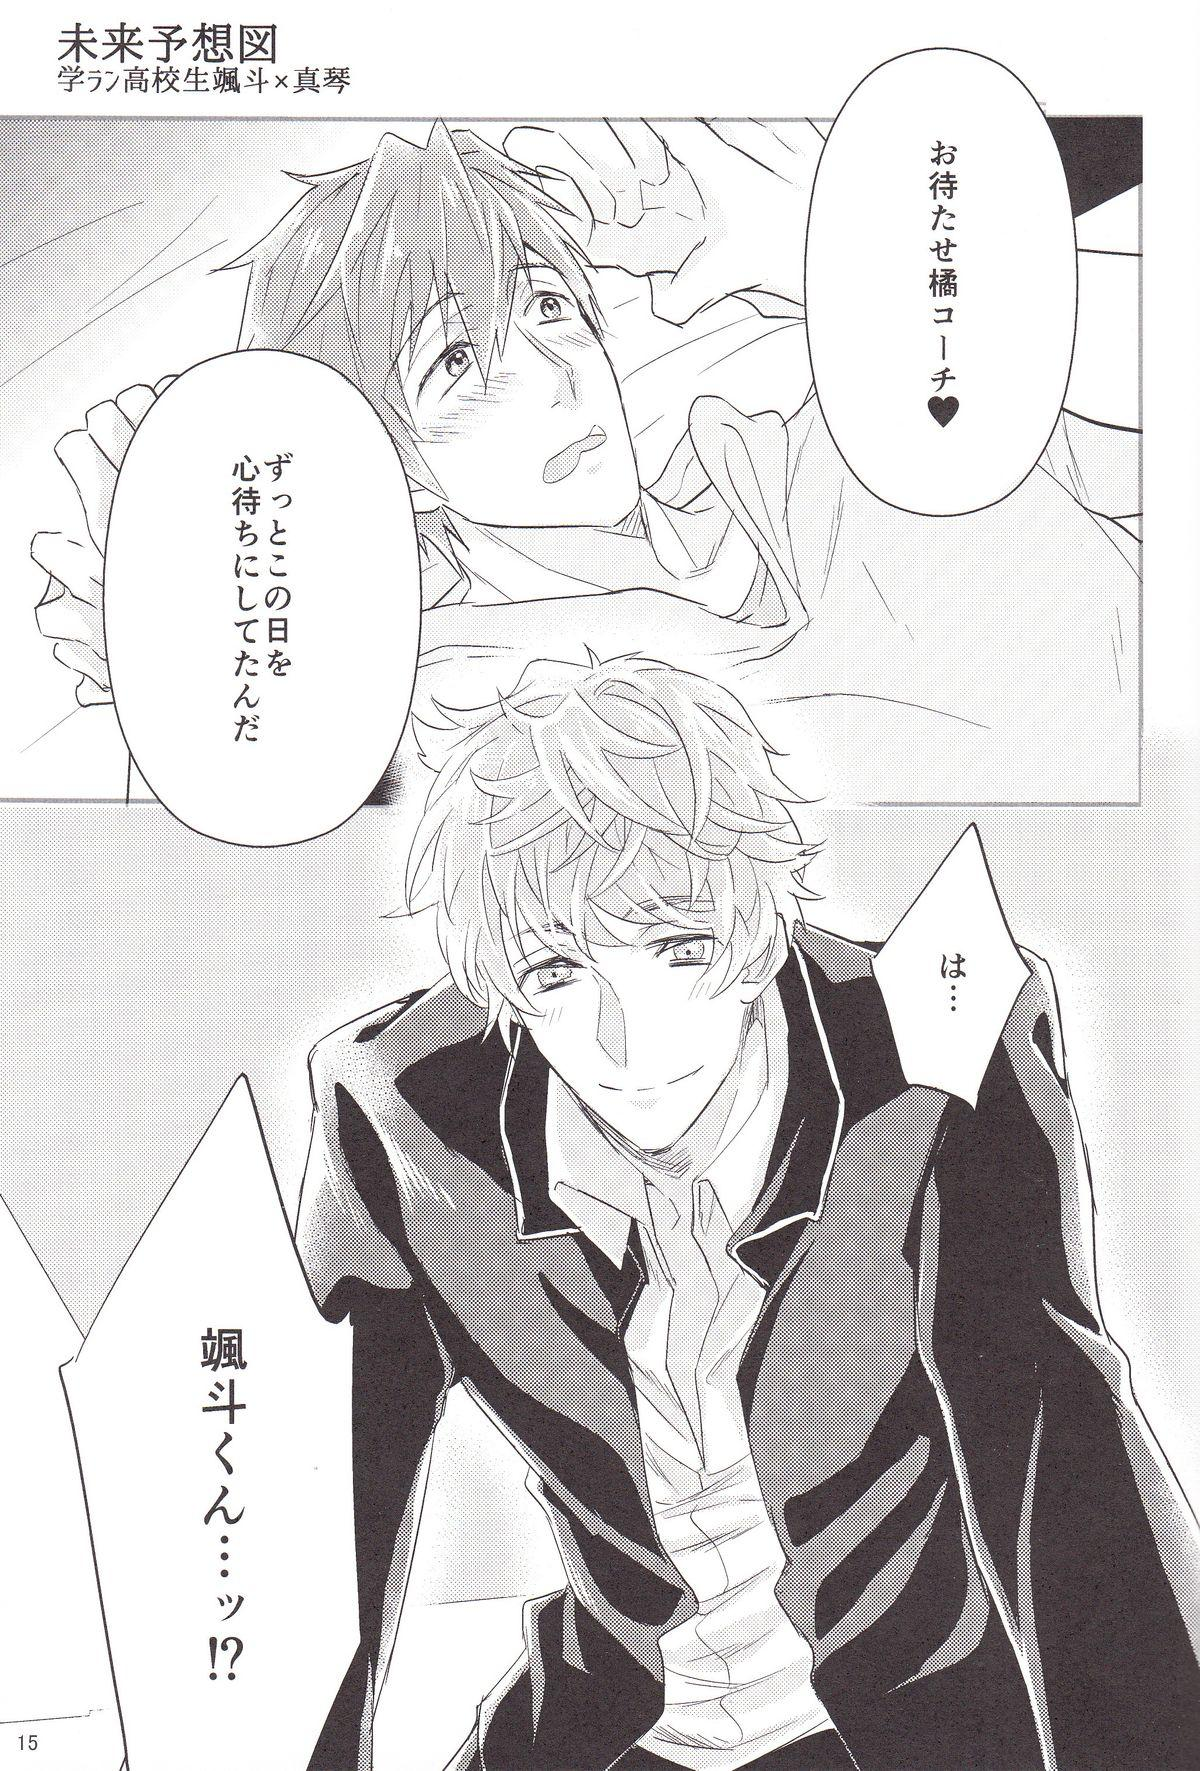 Tachibana Coach no Kojin Lesson 13